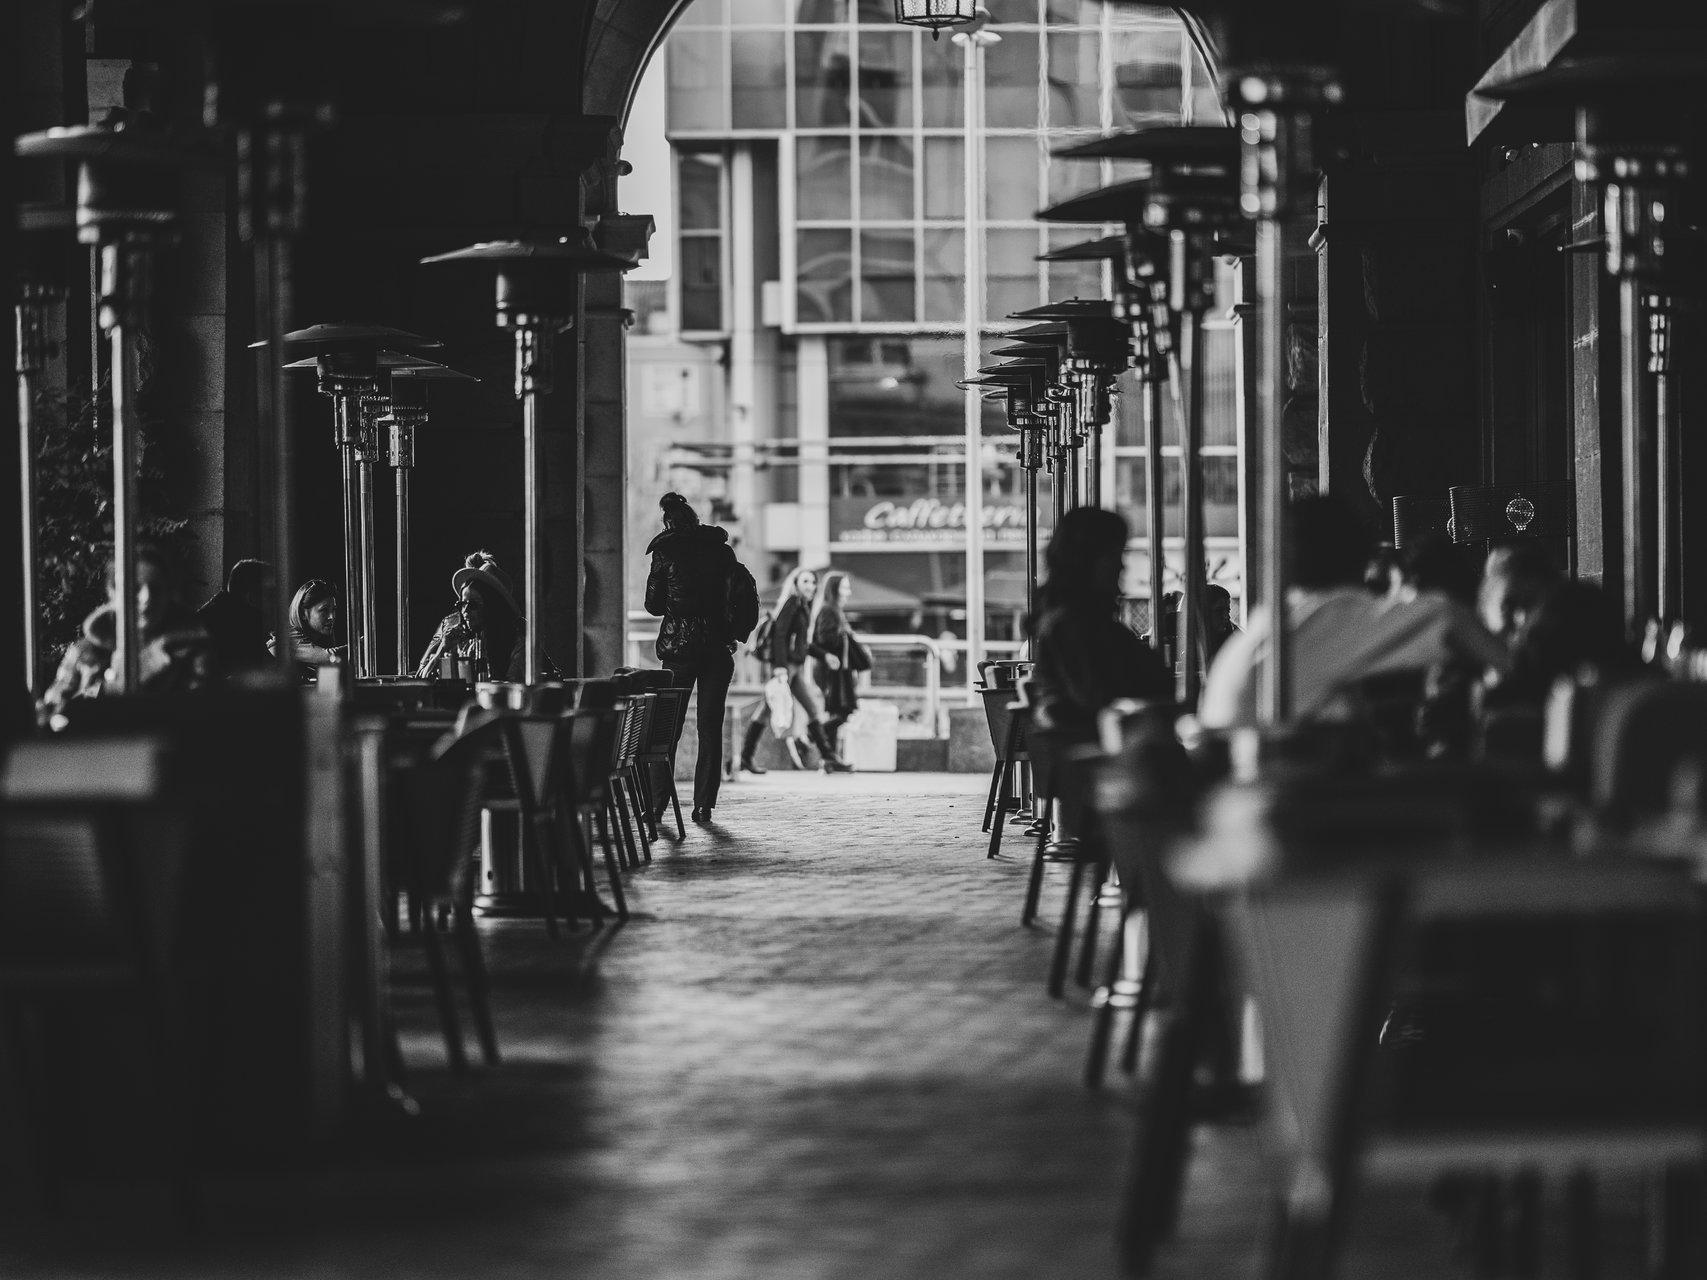 Largo | Author thephotonub | PHOTO FORUM